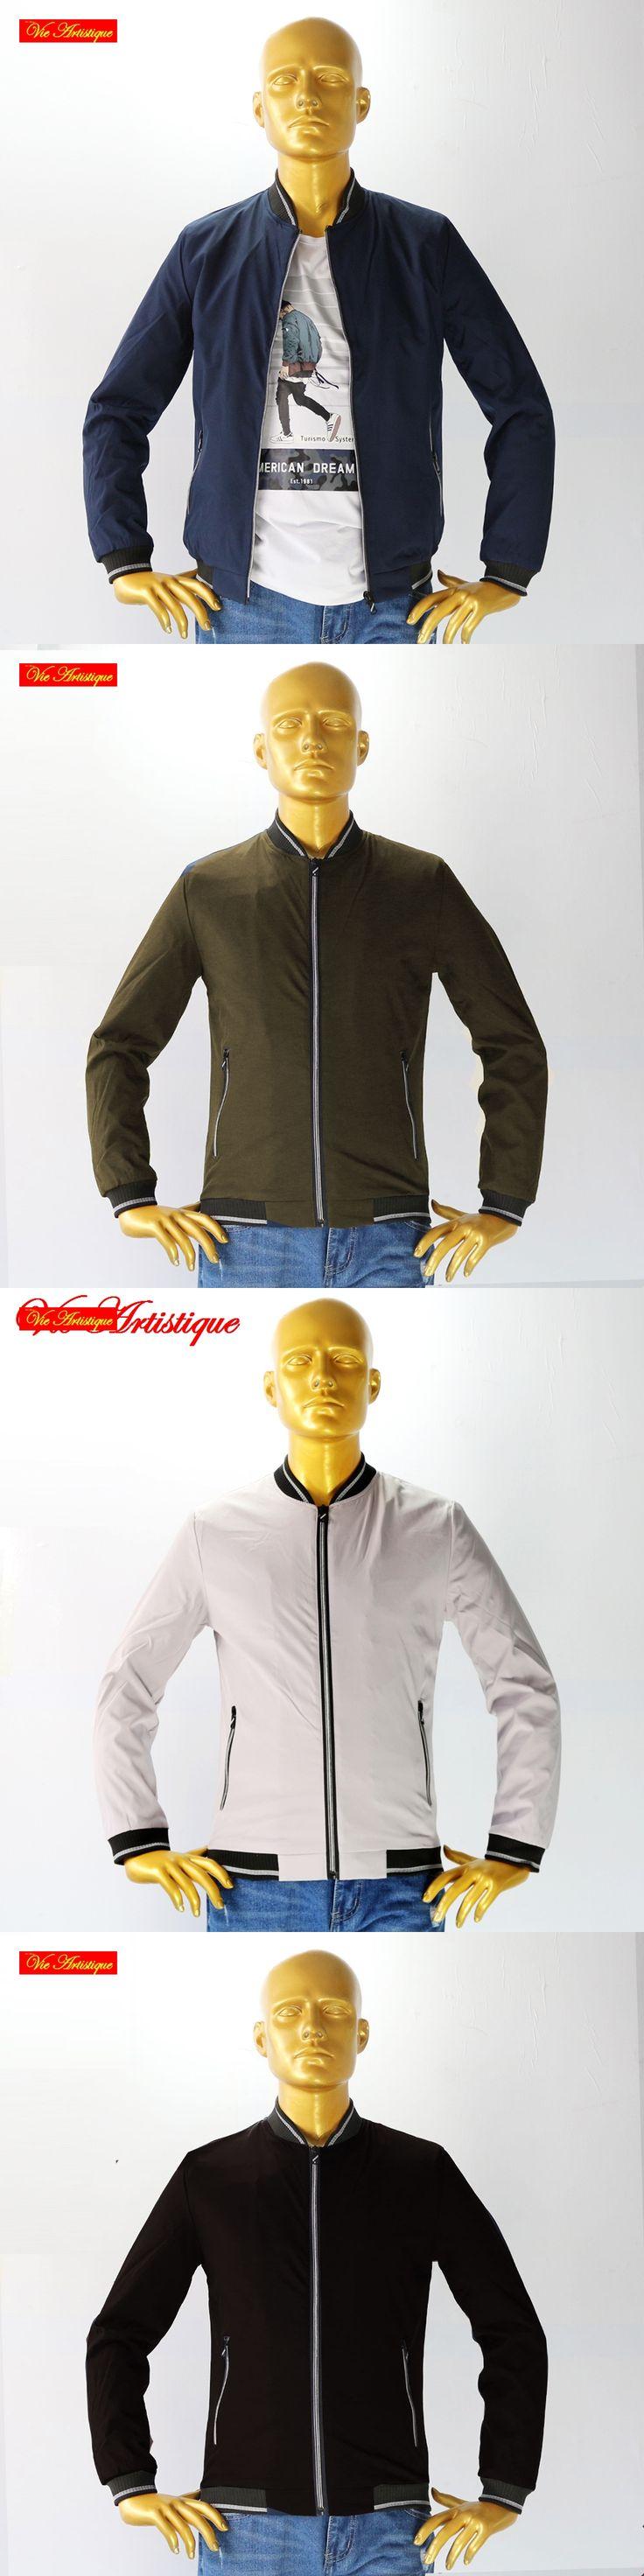 VA 2018 spring fall men's flight bomber baseball casual designer jacket oversize navy black off-white army windbreaker coat